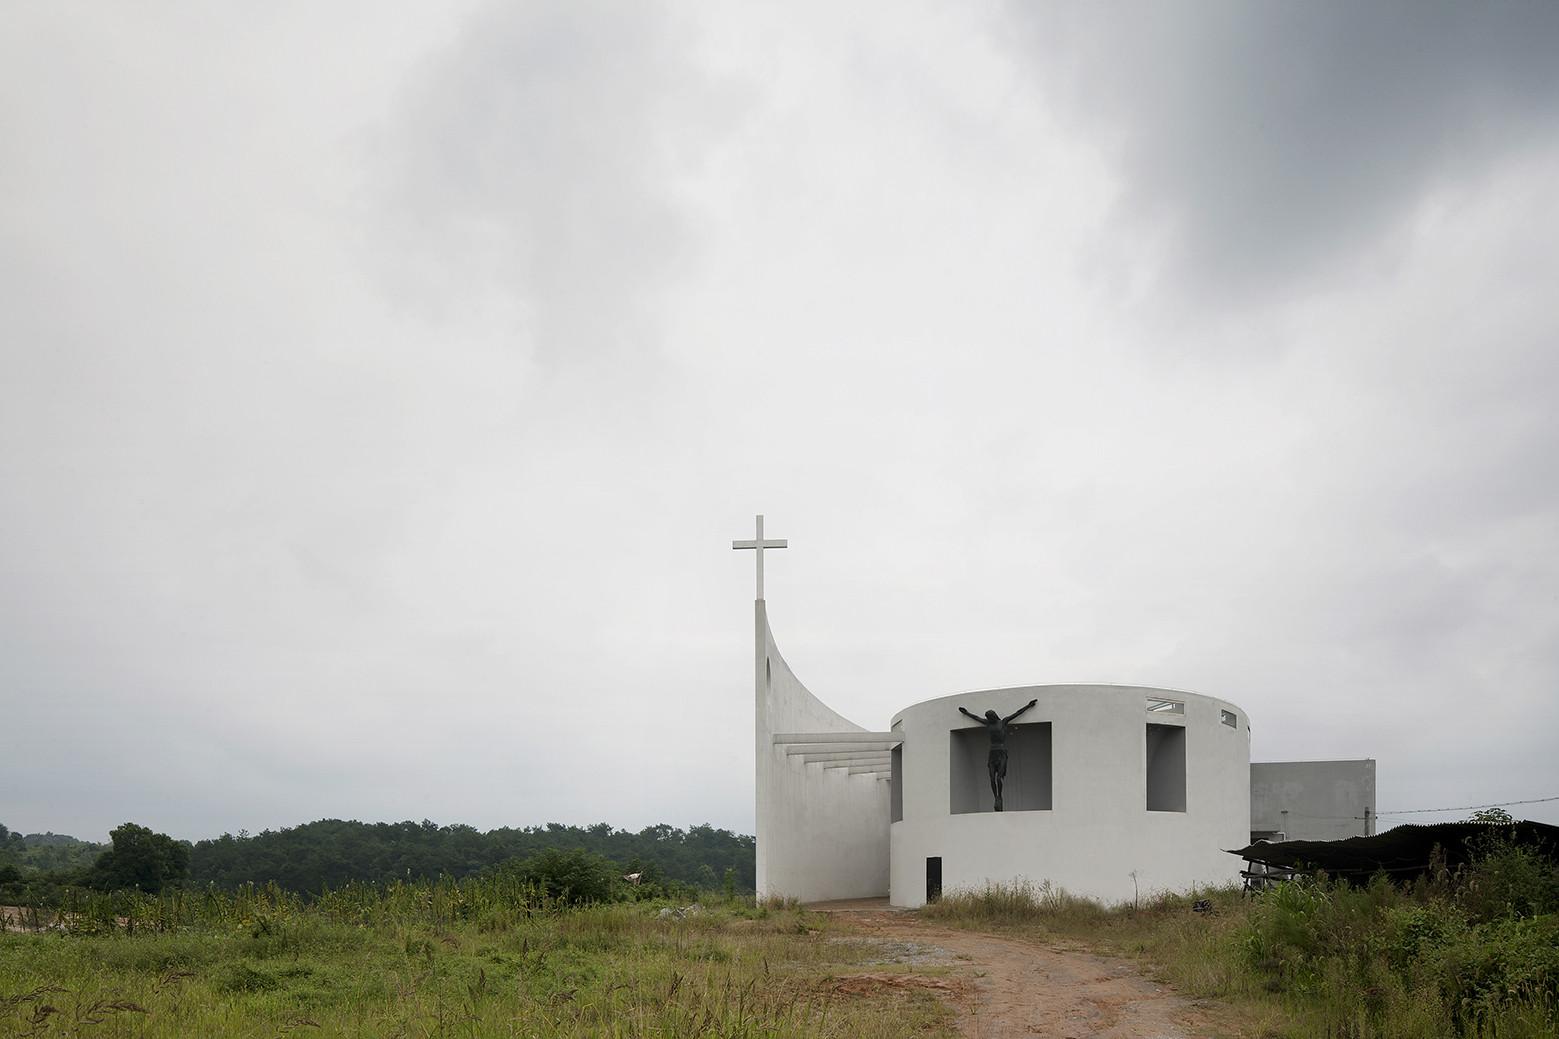 Qichun Catholic Church / Leekostudio, Courtesy of Leekostudio